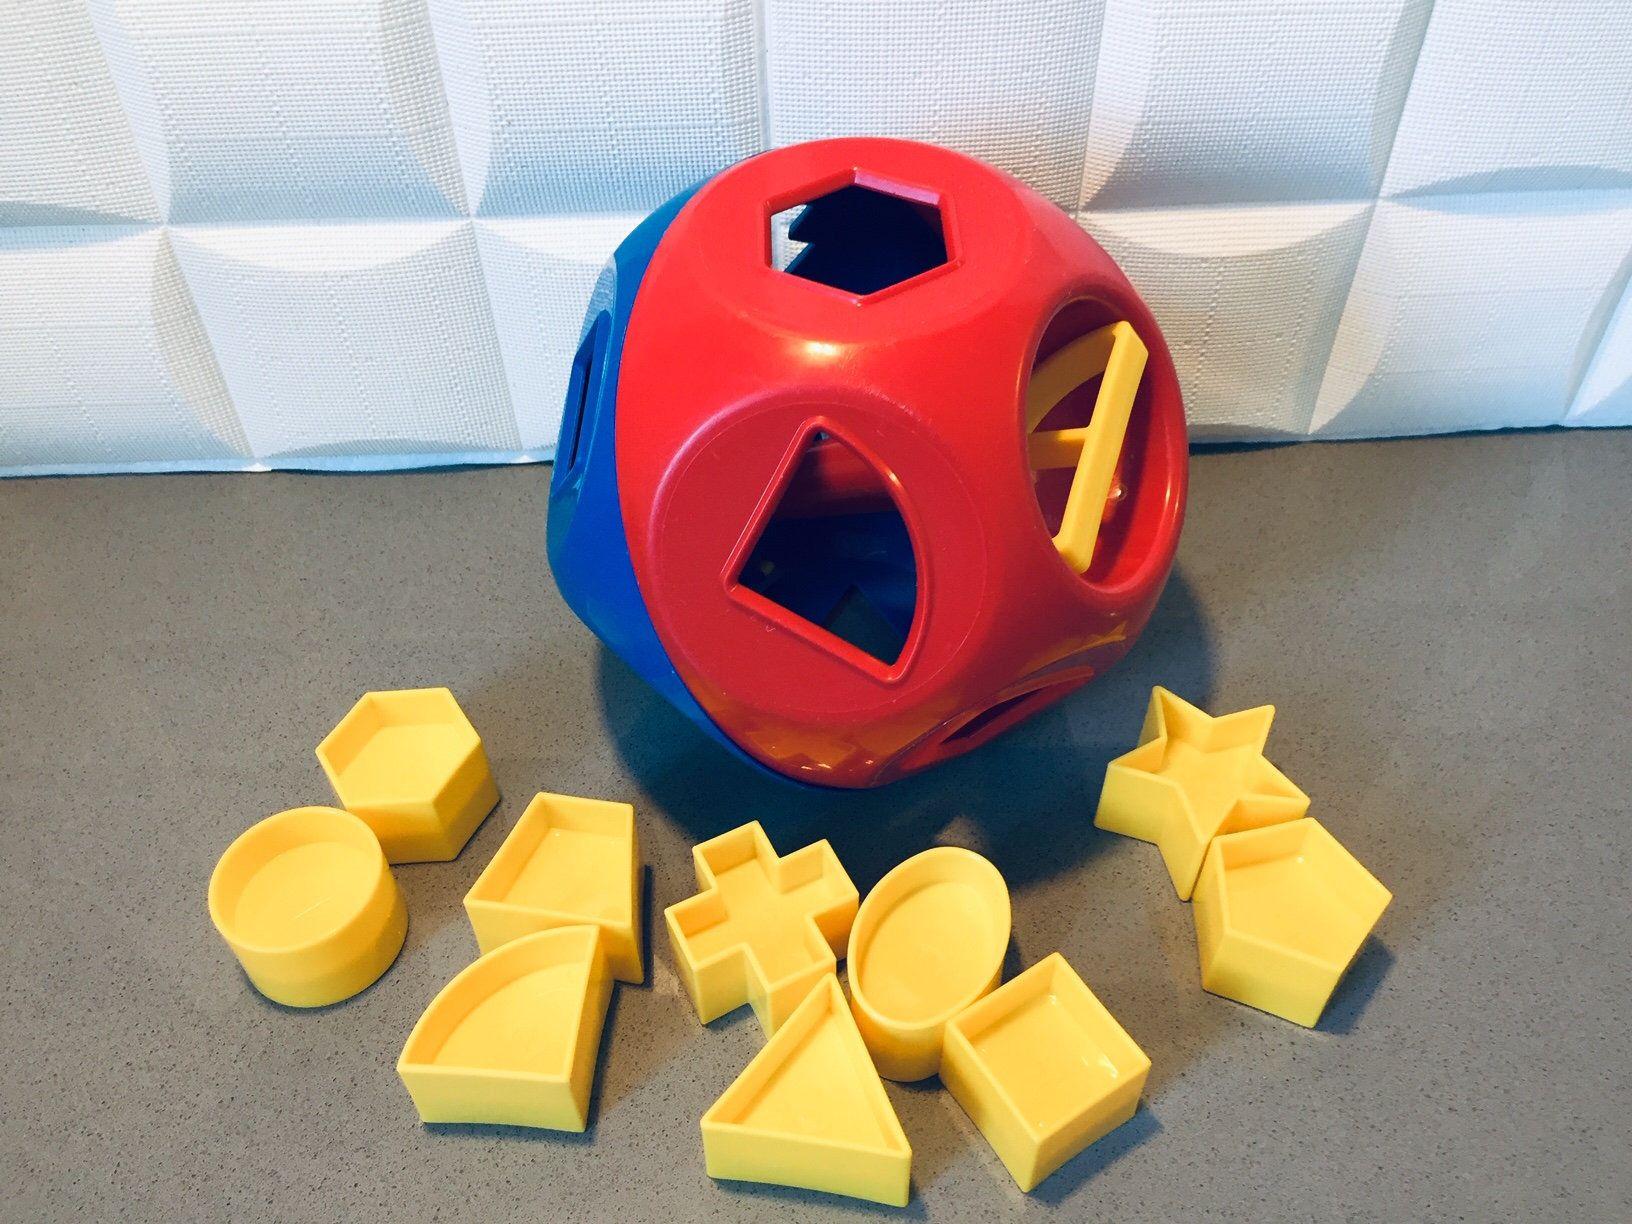 vtg tupperware jouets forme boule